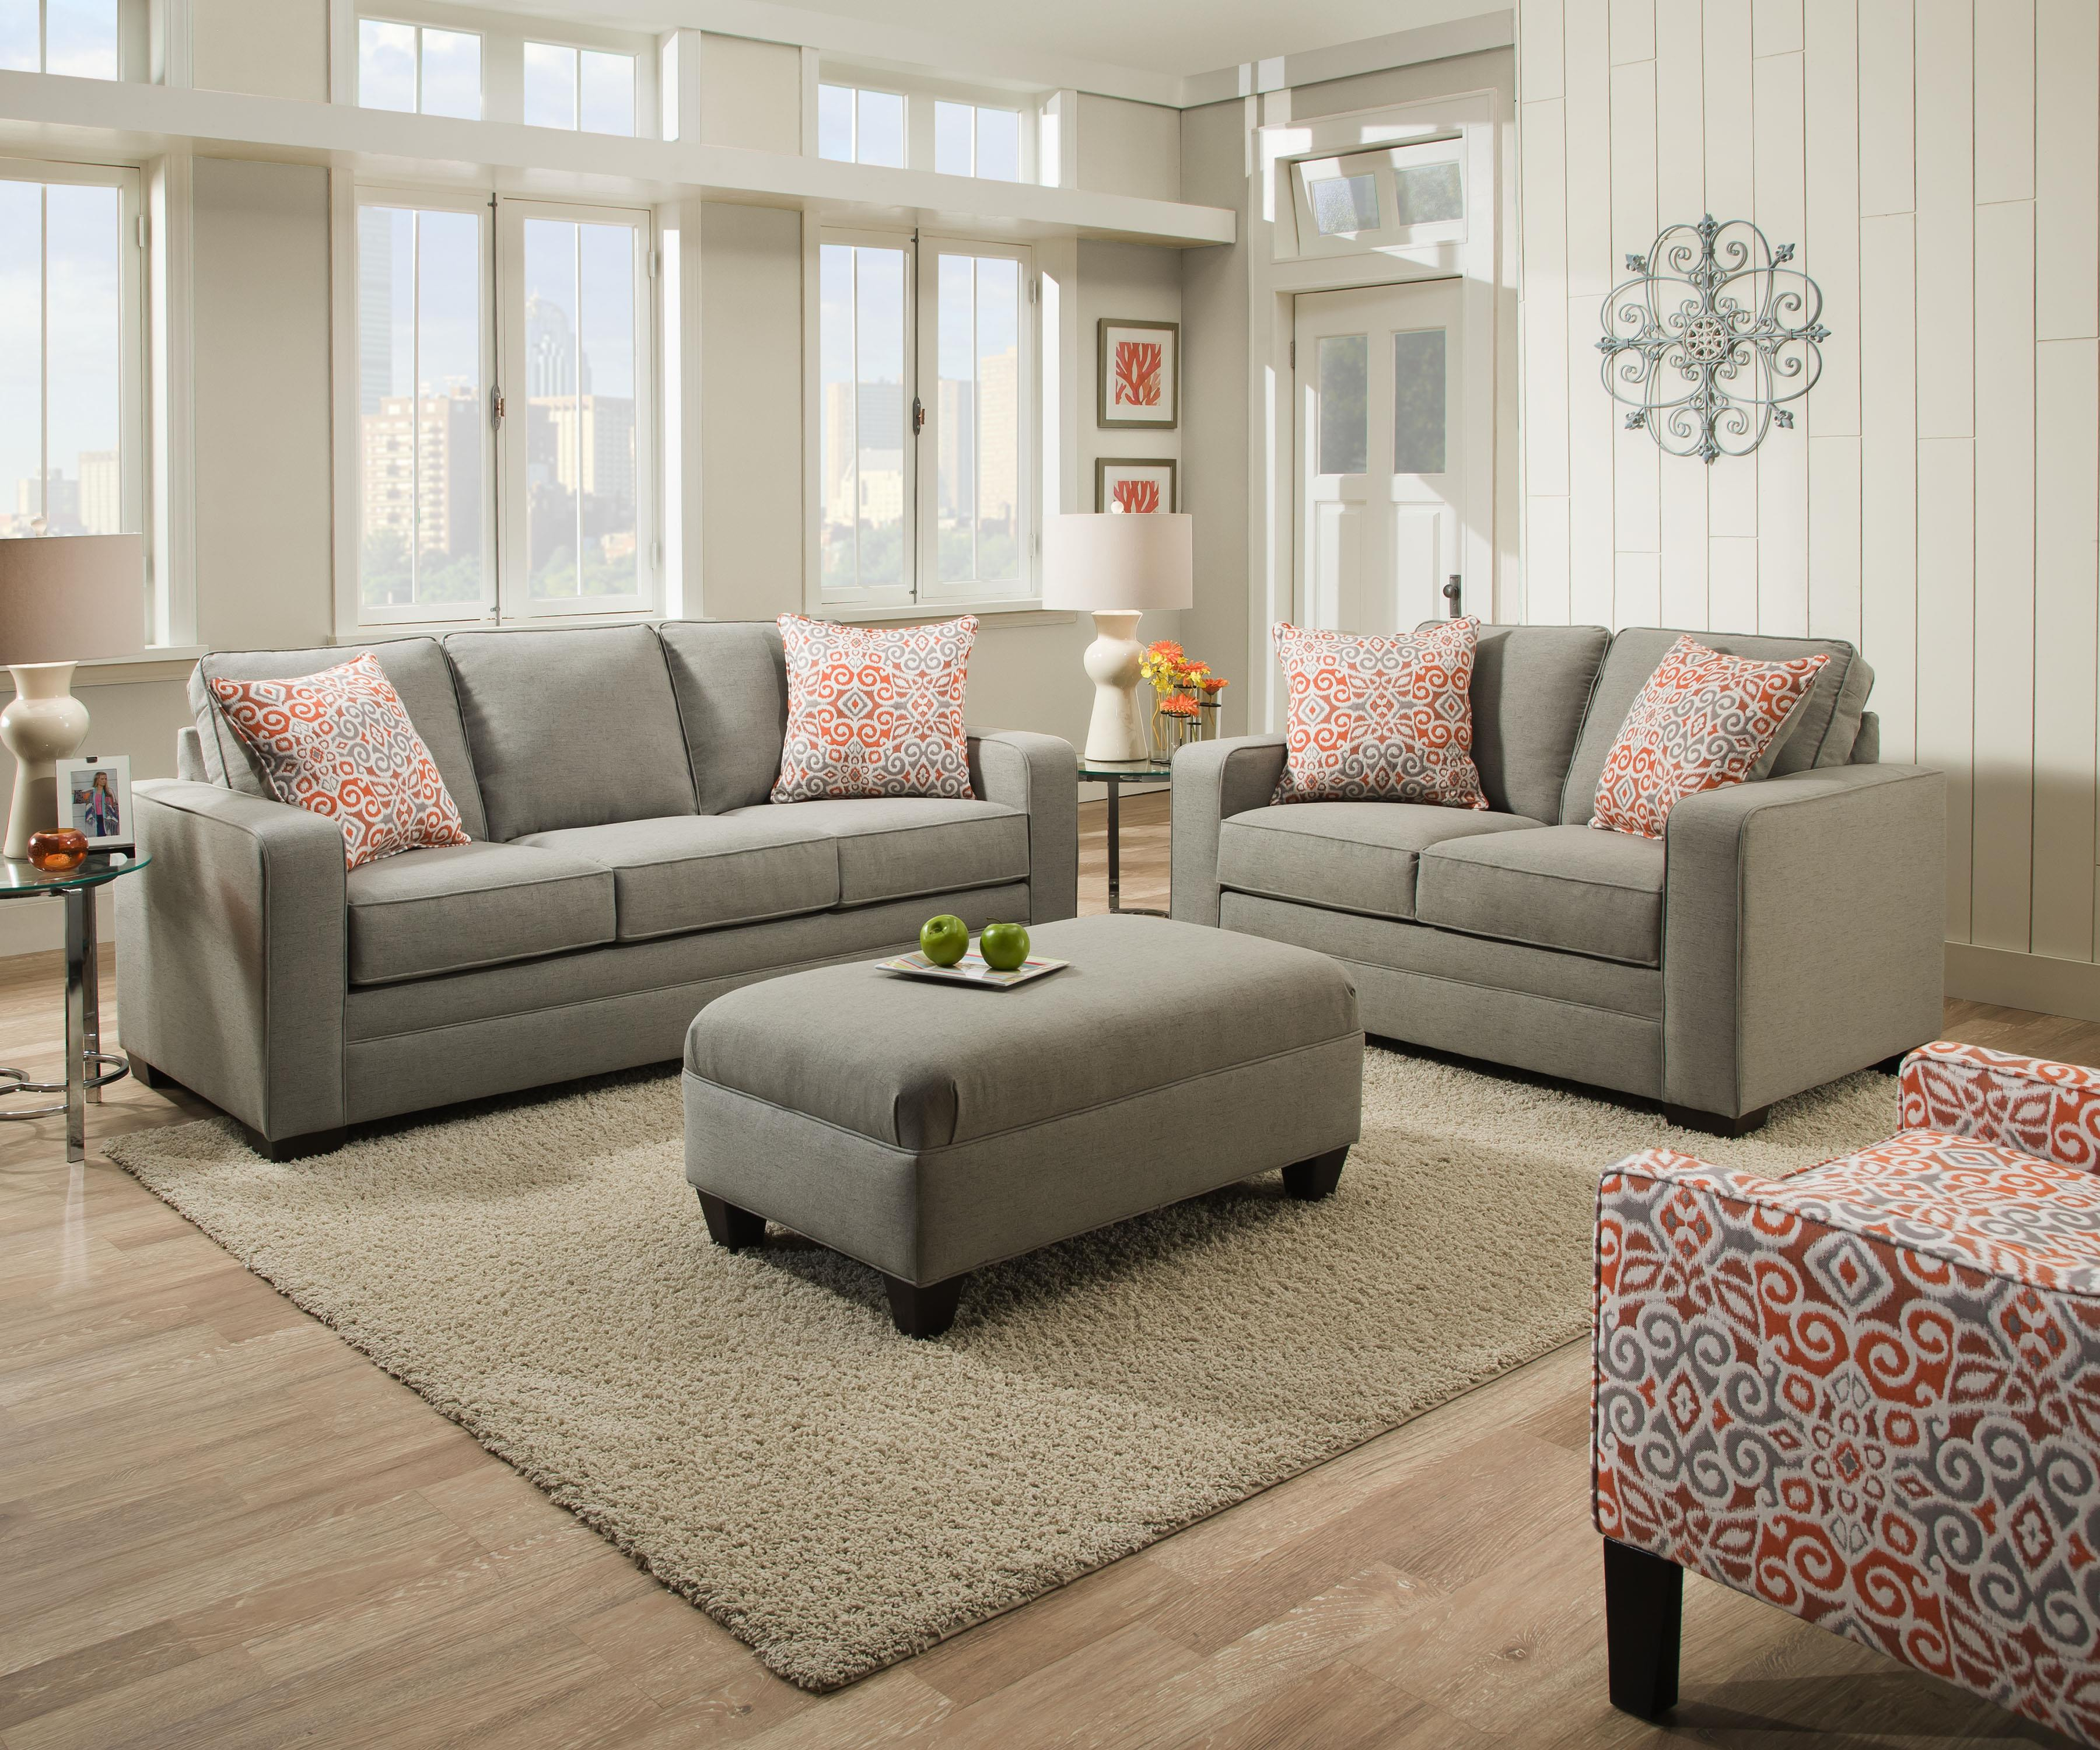 Simmons Upholstery 9064 United 9064sofa Transitional Sofa